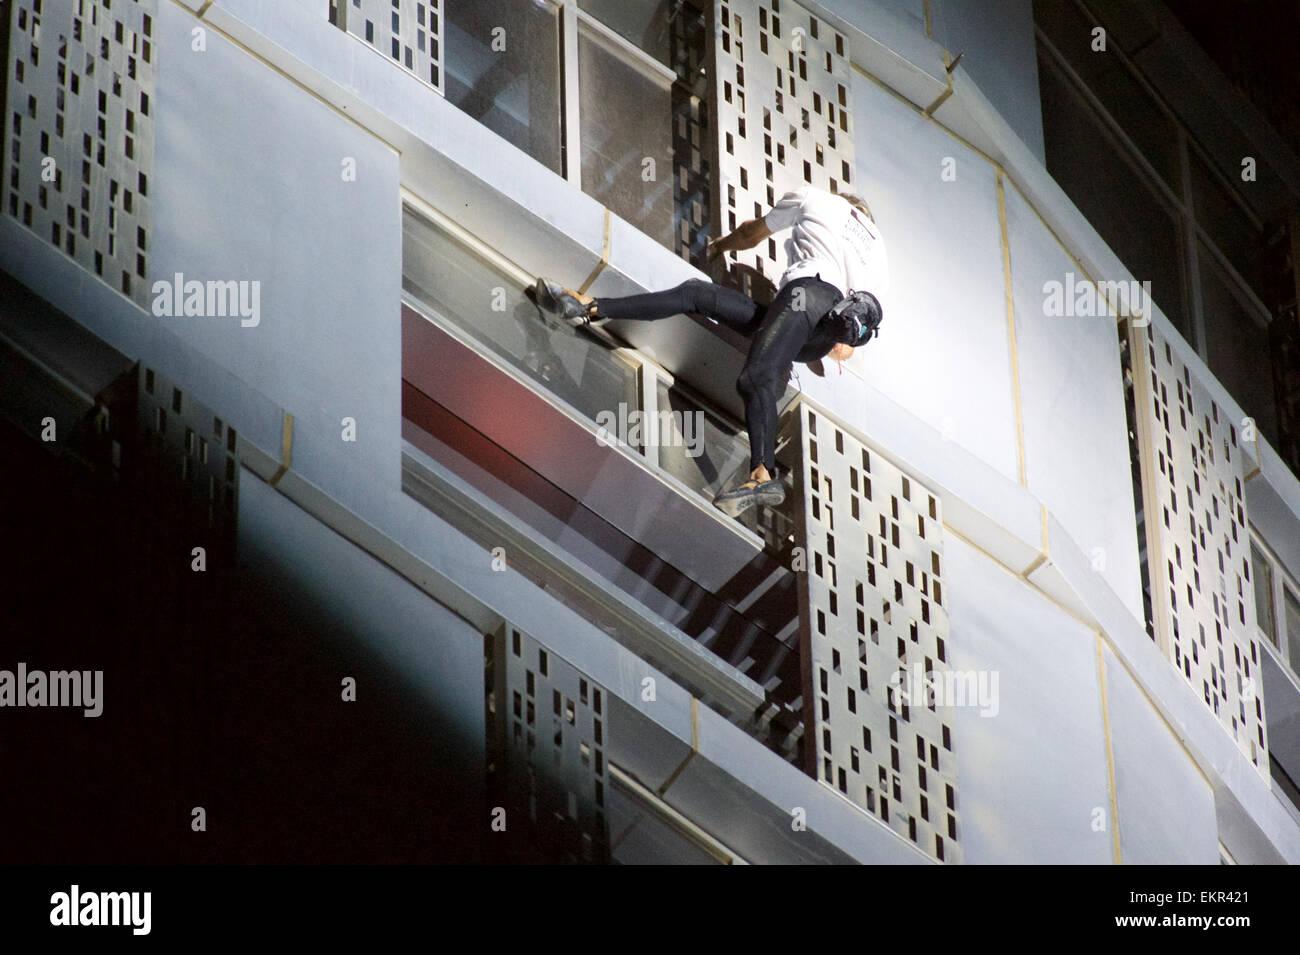 Dubai Marina, Dubai, UAE. 12th April, 2015.  French 'Spiderman' Alain Robert free climbed the 306m high, - Stock Image